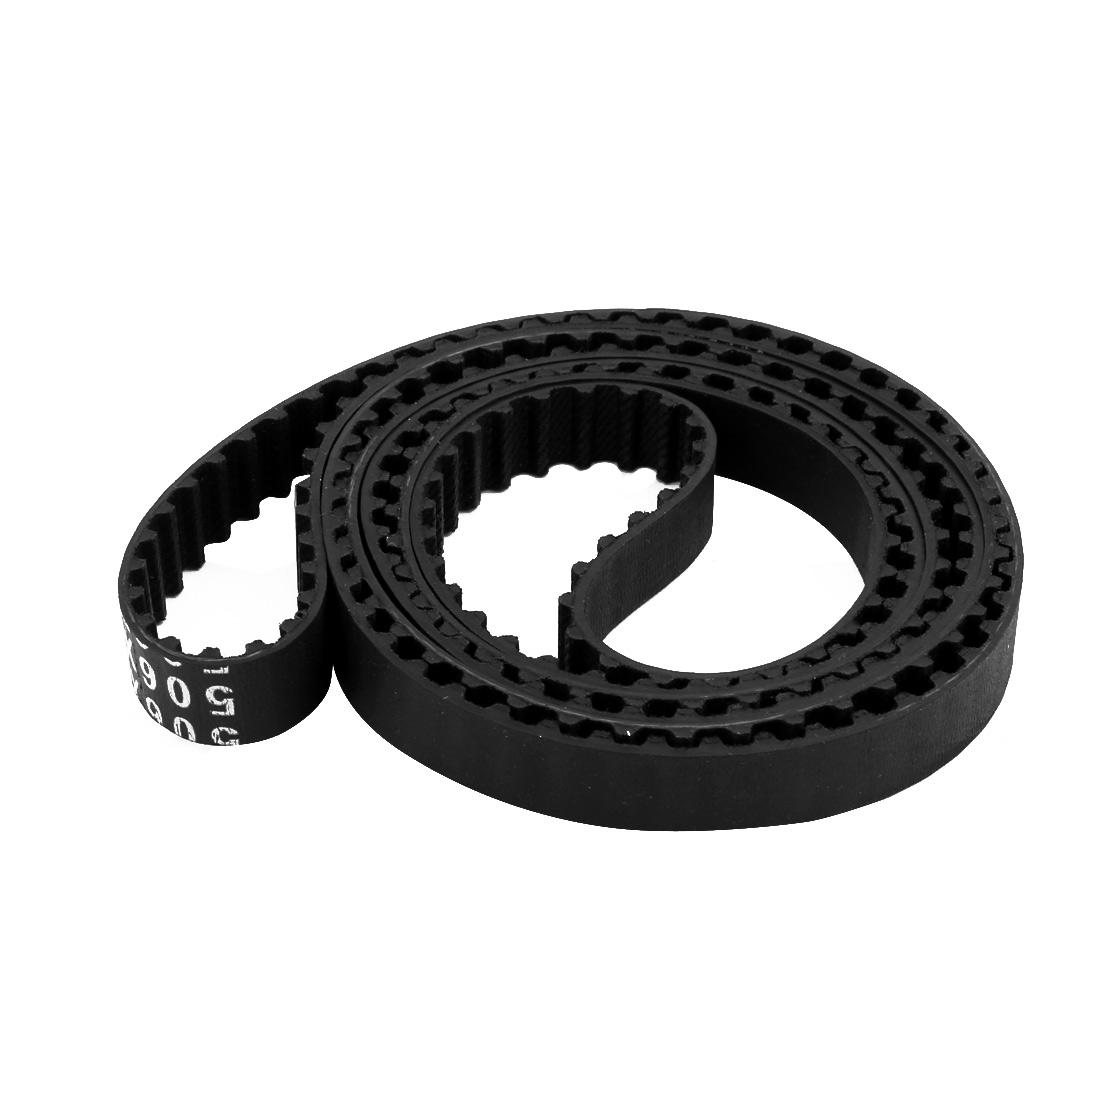 506XL 253 Teeth 10mm Width 5.08mm Pitch Stepper Motor Rubber Timing Geared Belt